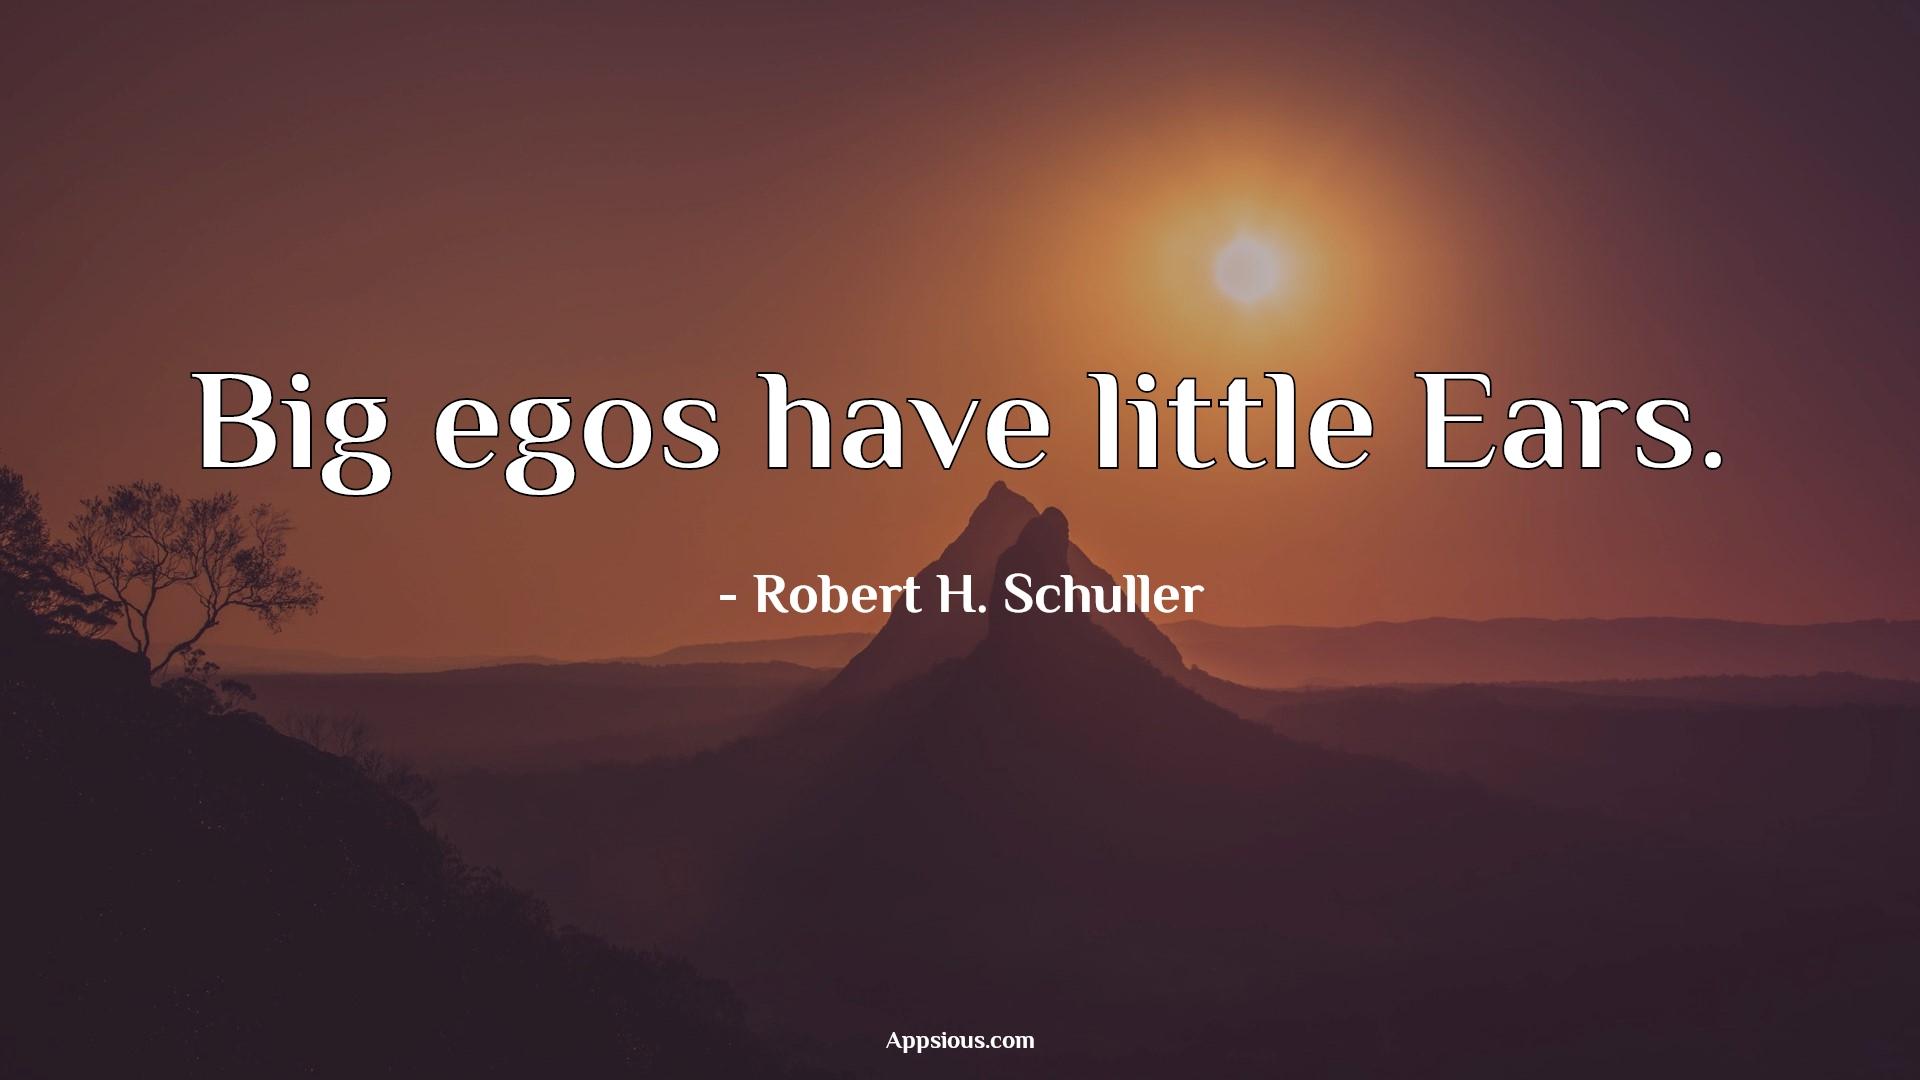 Big egos have little Ears.